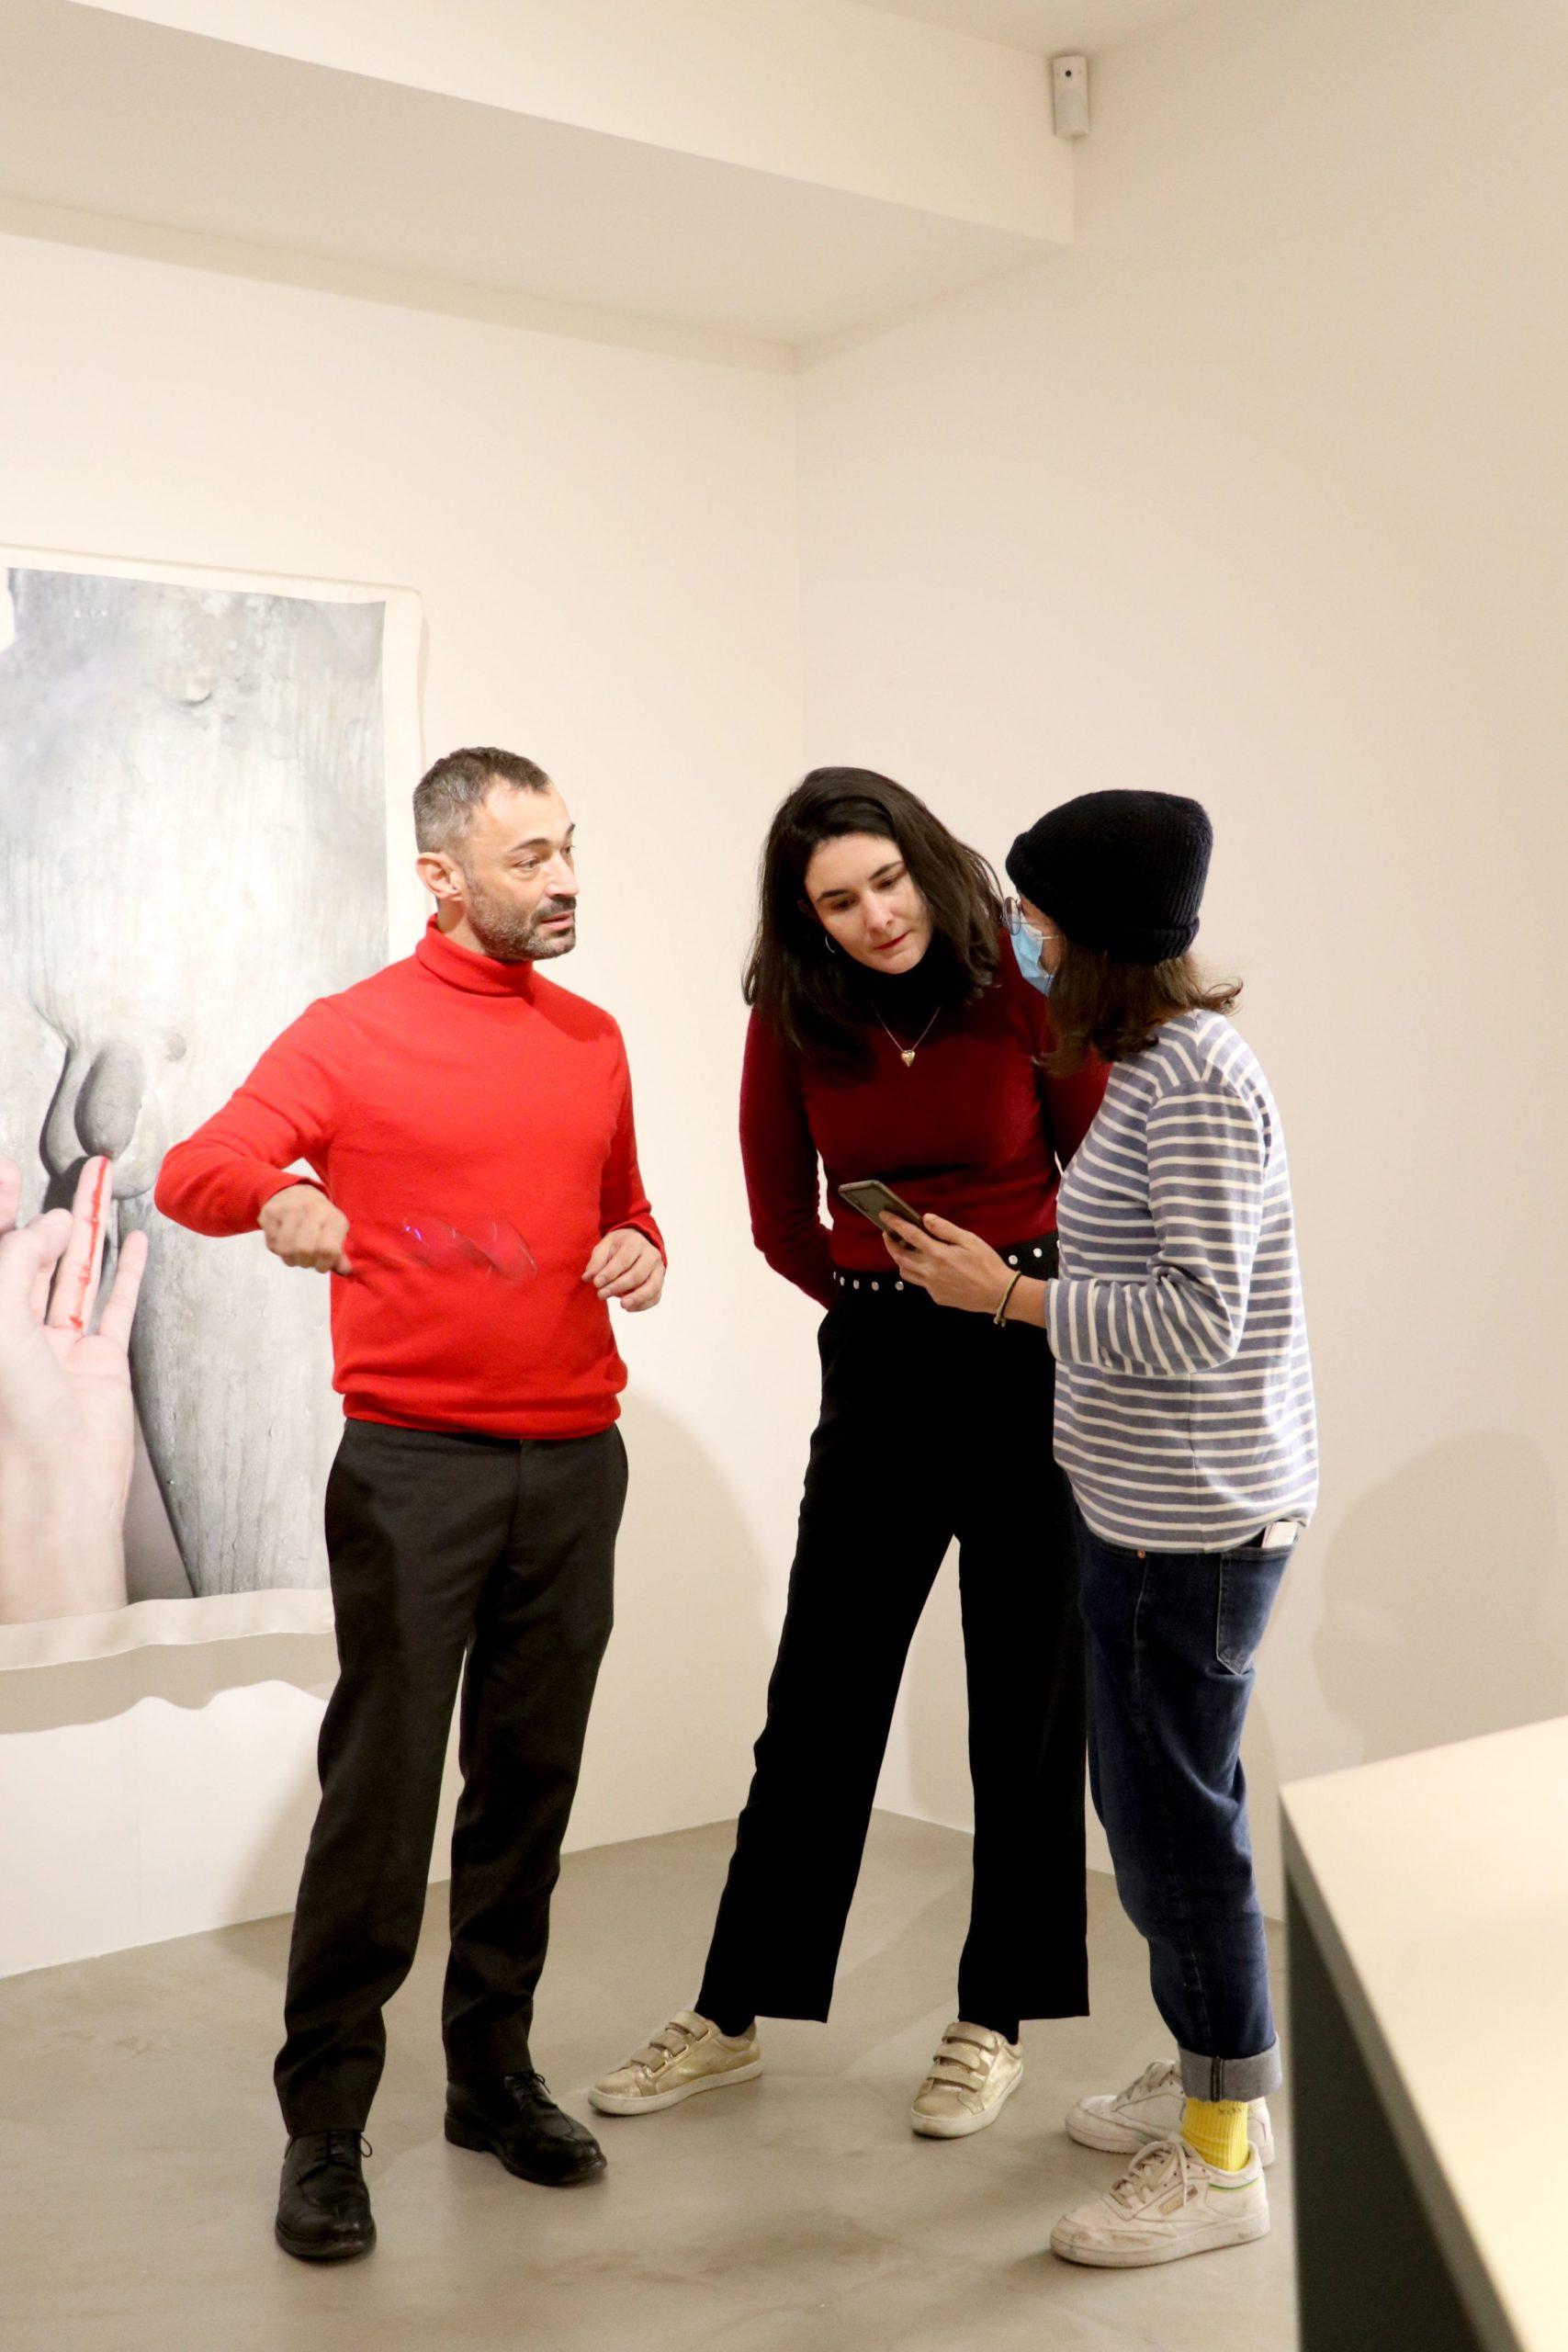 Galerie Poggi Nikita Kadan The Day Of Blood © CLAD / THE FARM